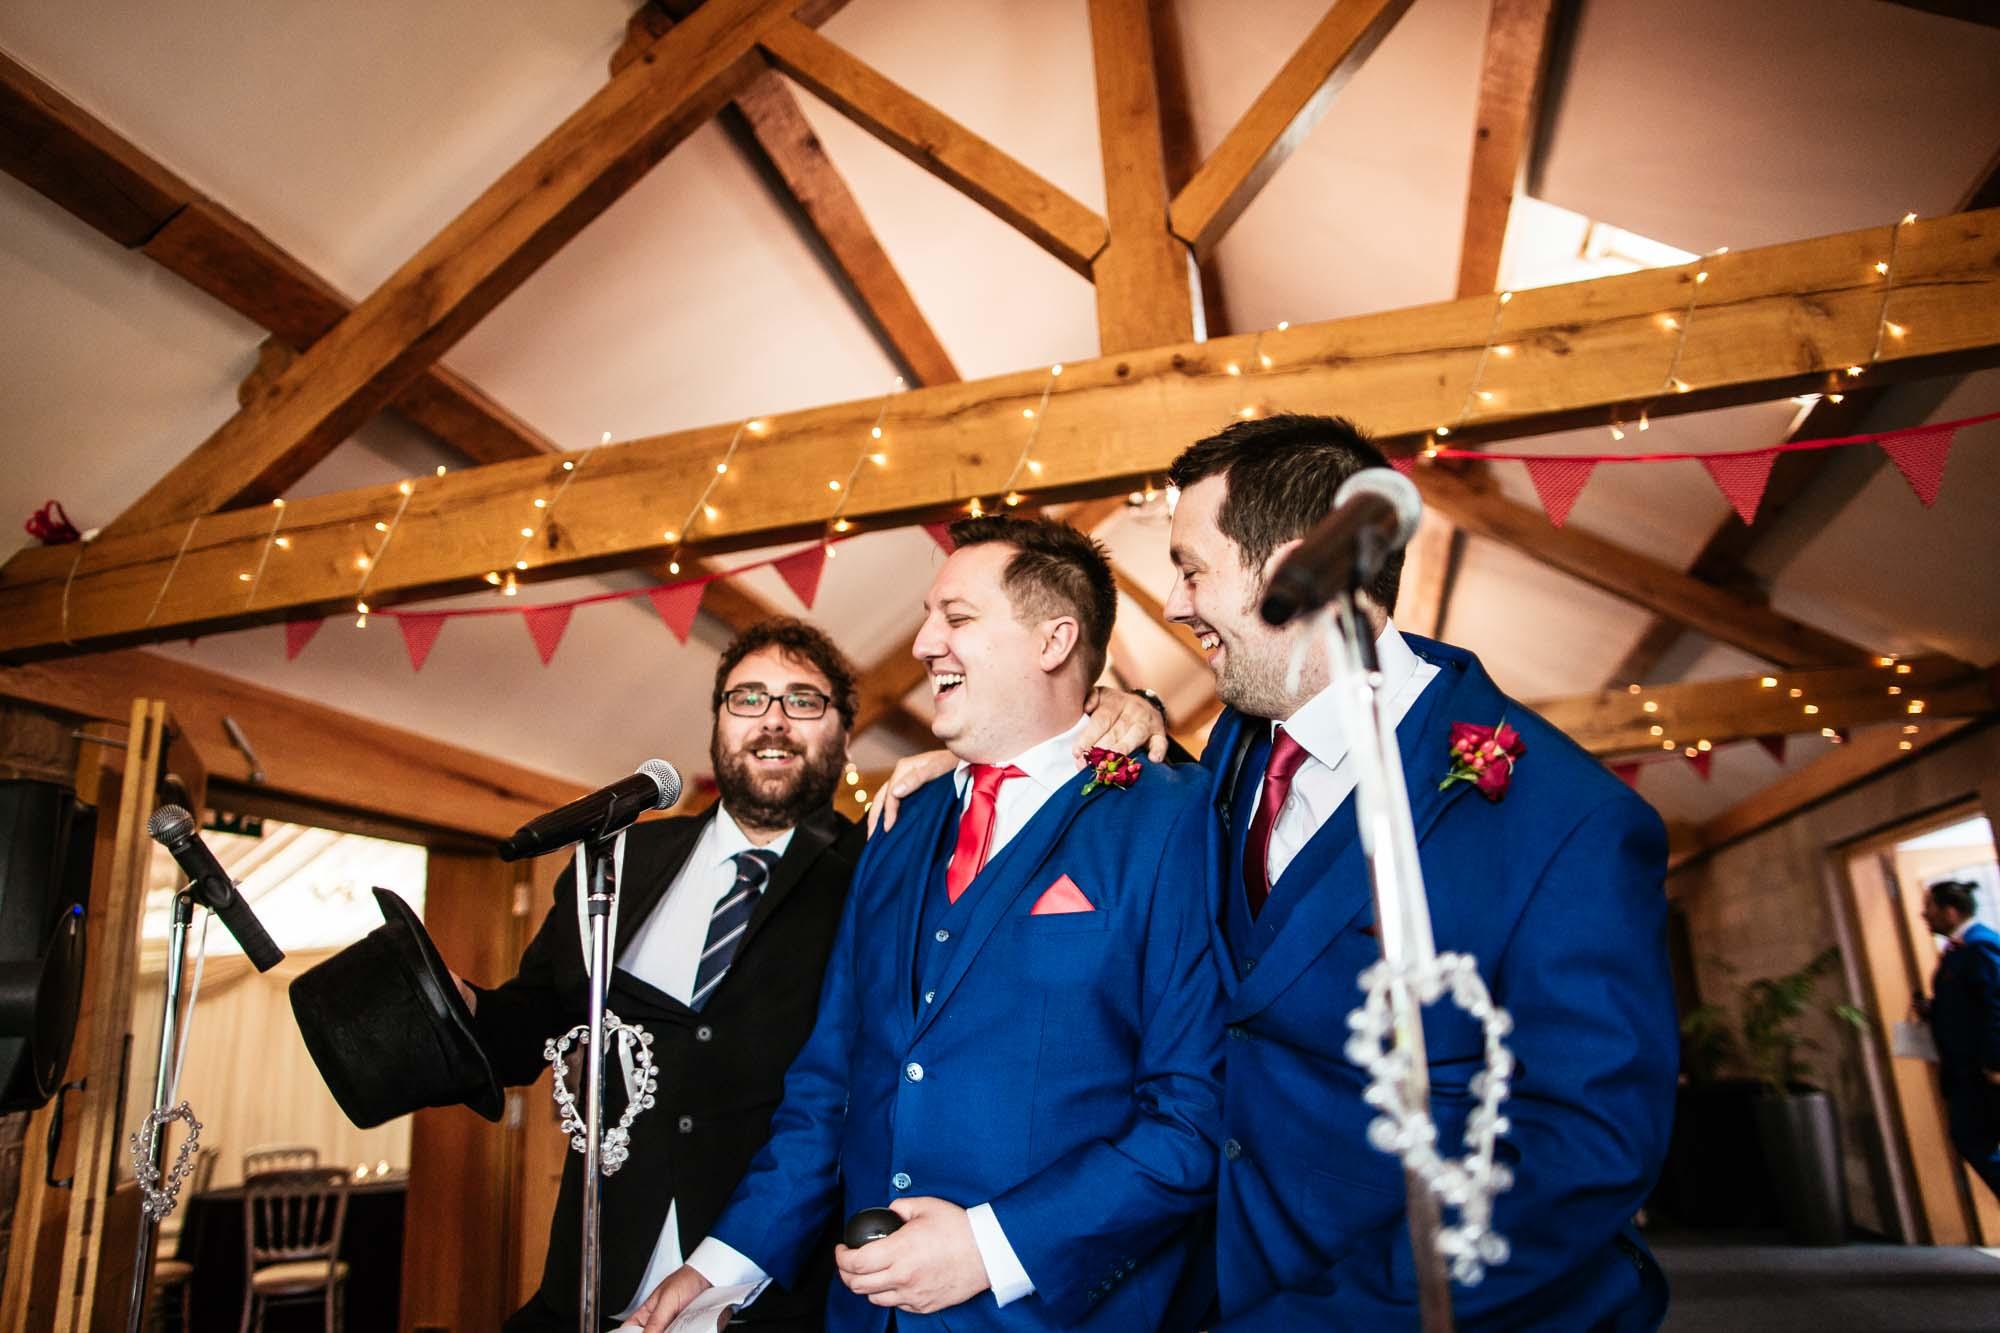 Heaton House Farm Fun Wedding Photographer